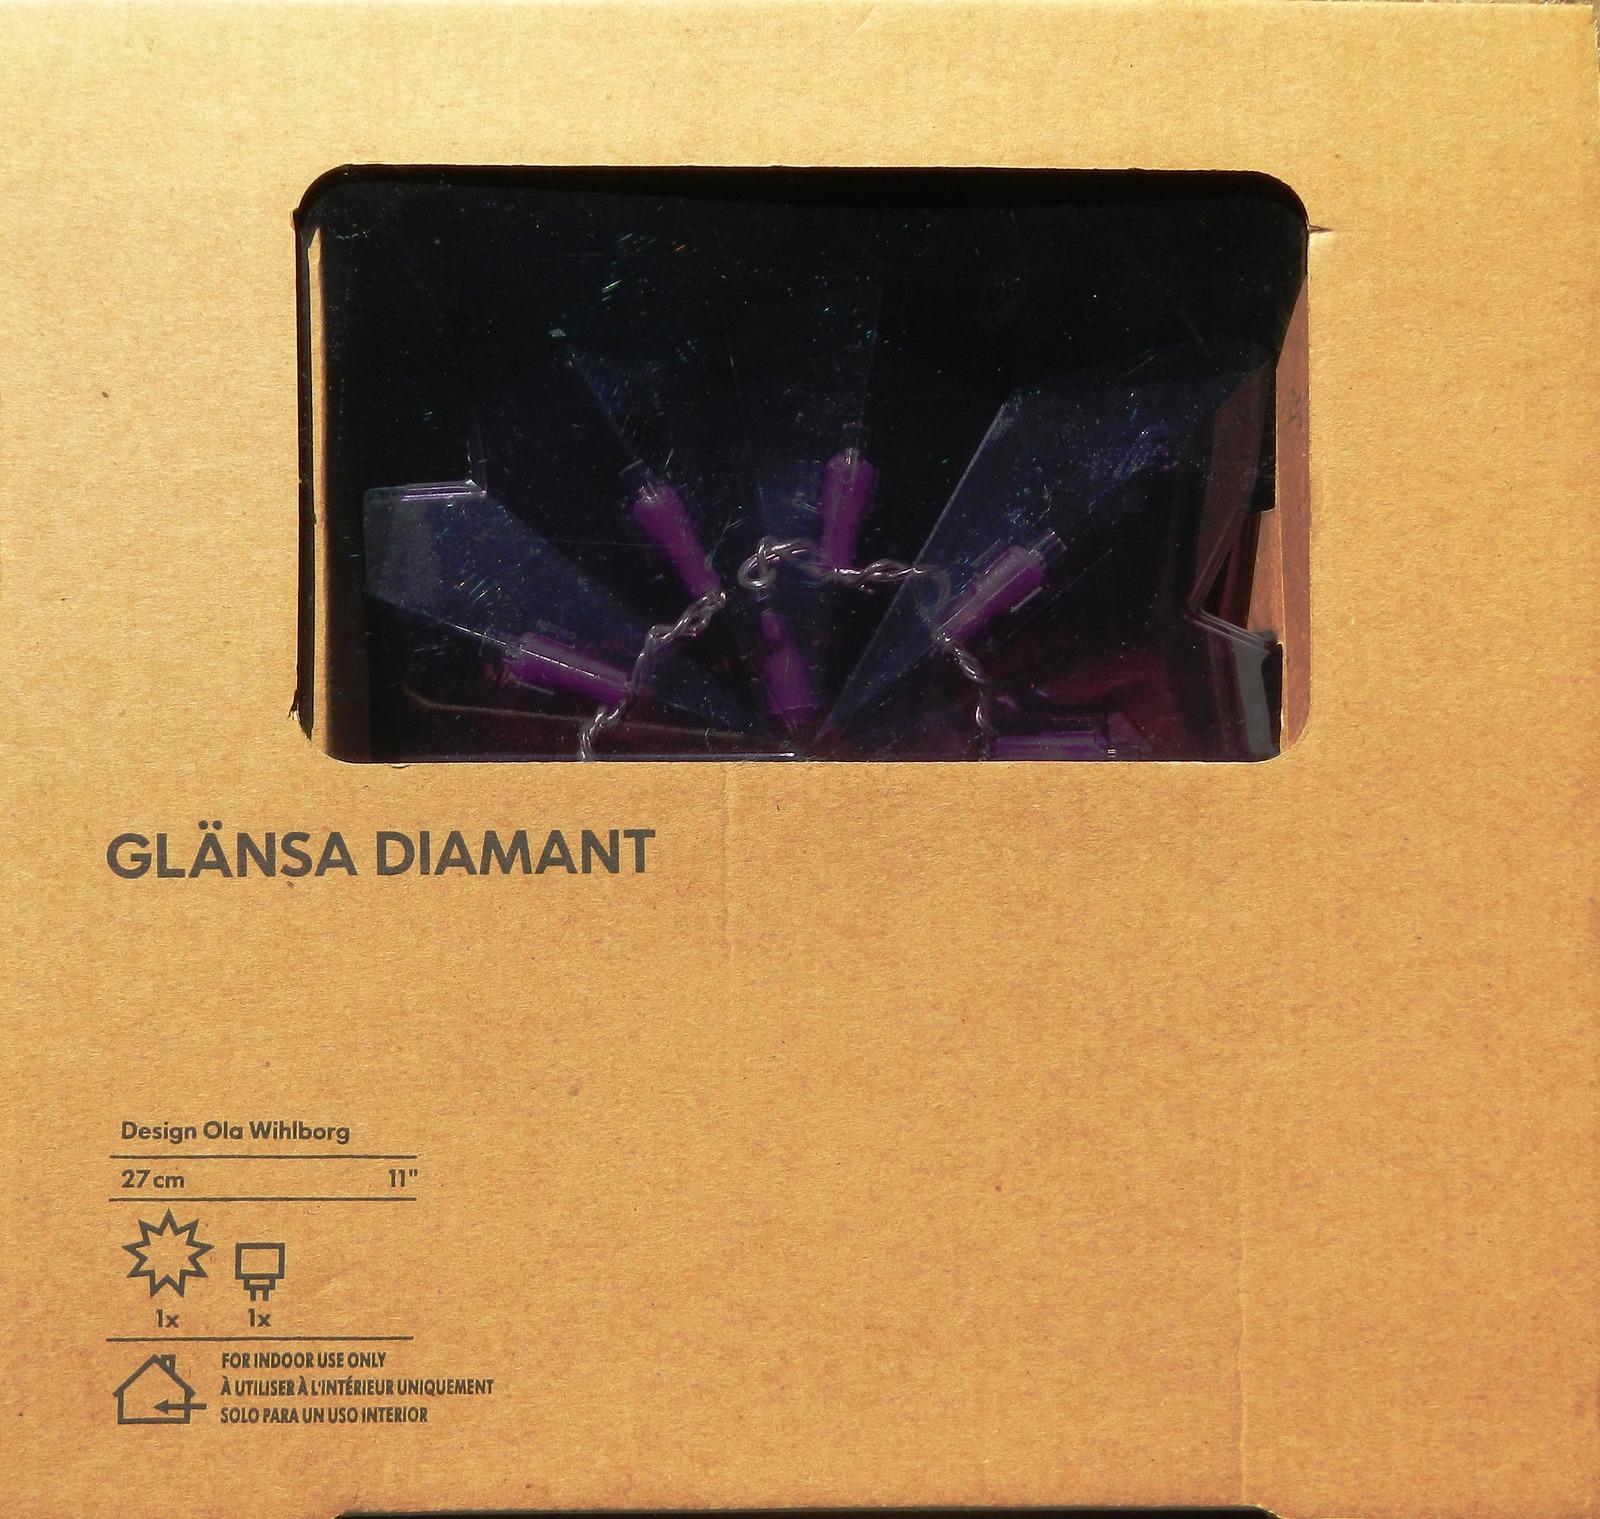 Ikea Glansa Holiday Purple Diamond Star LED Lamp NEW IN BOX - 2007